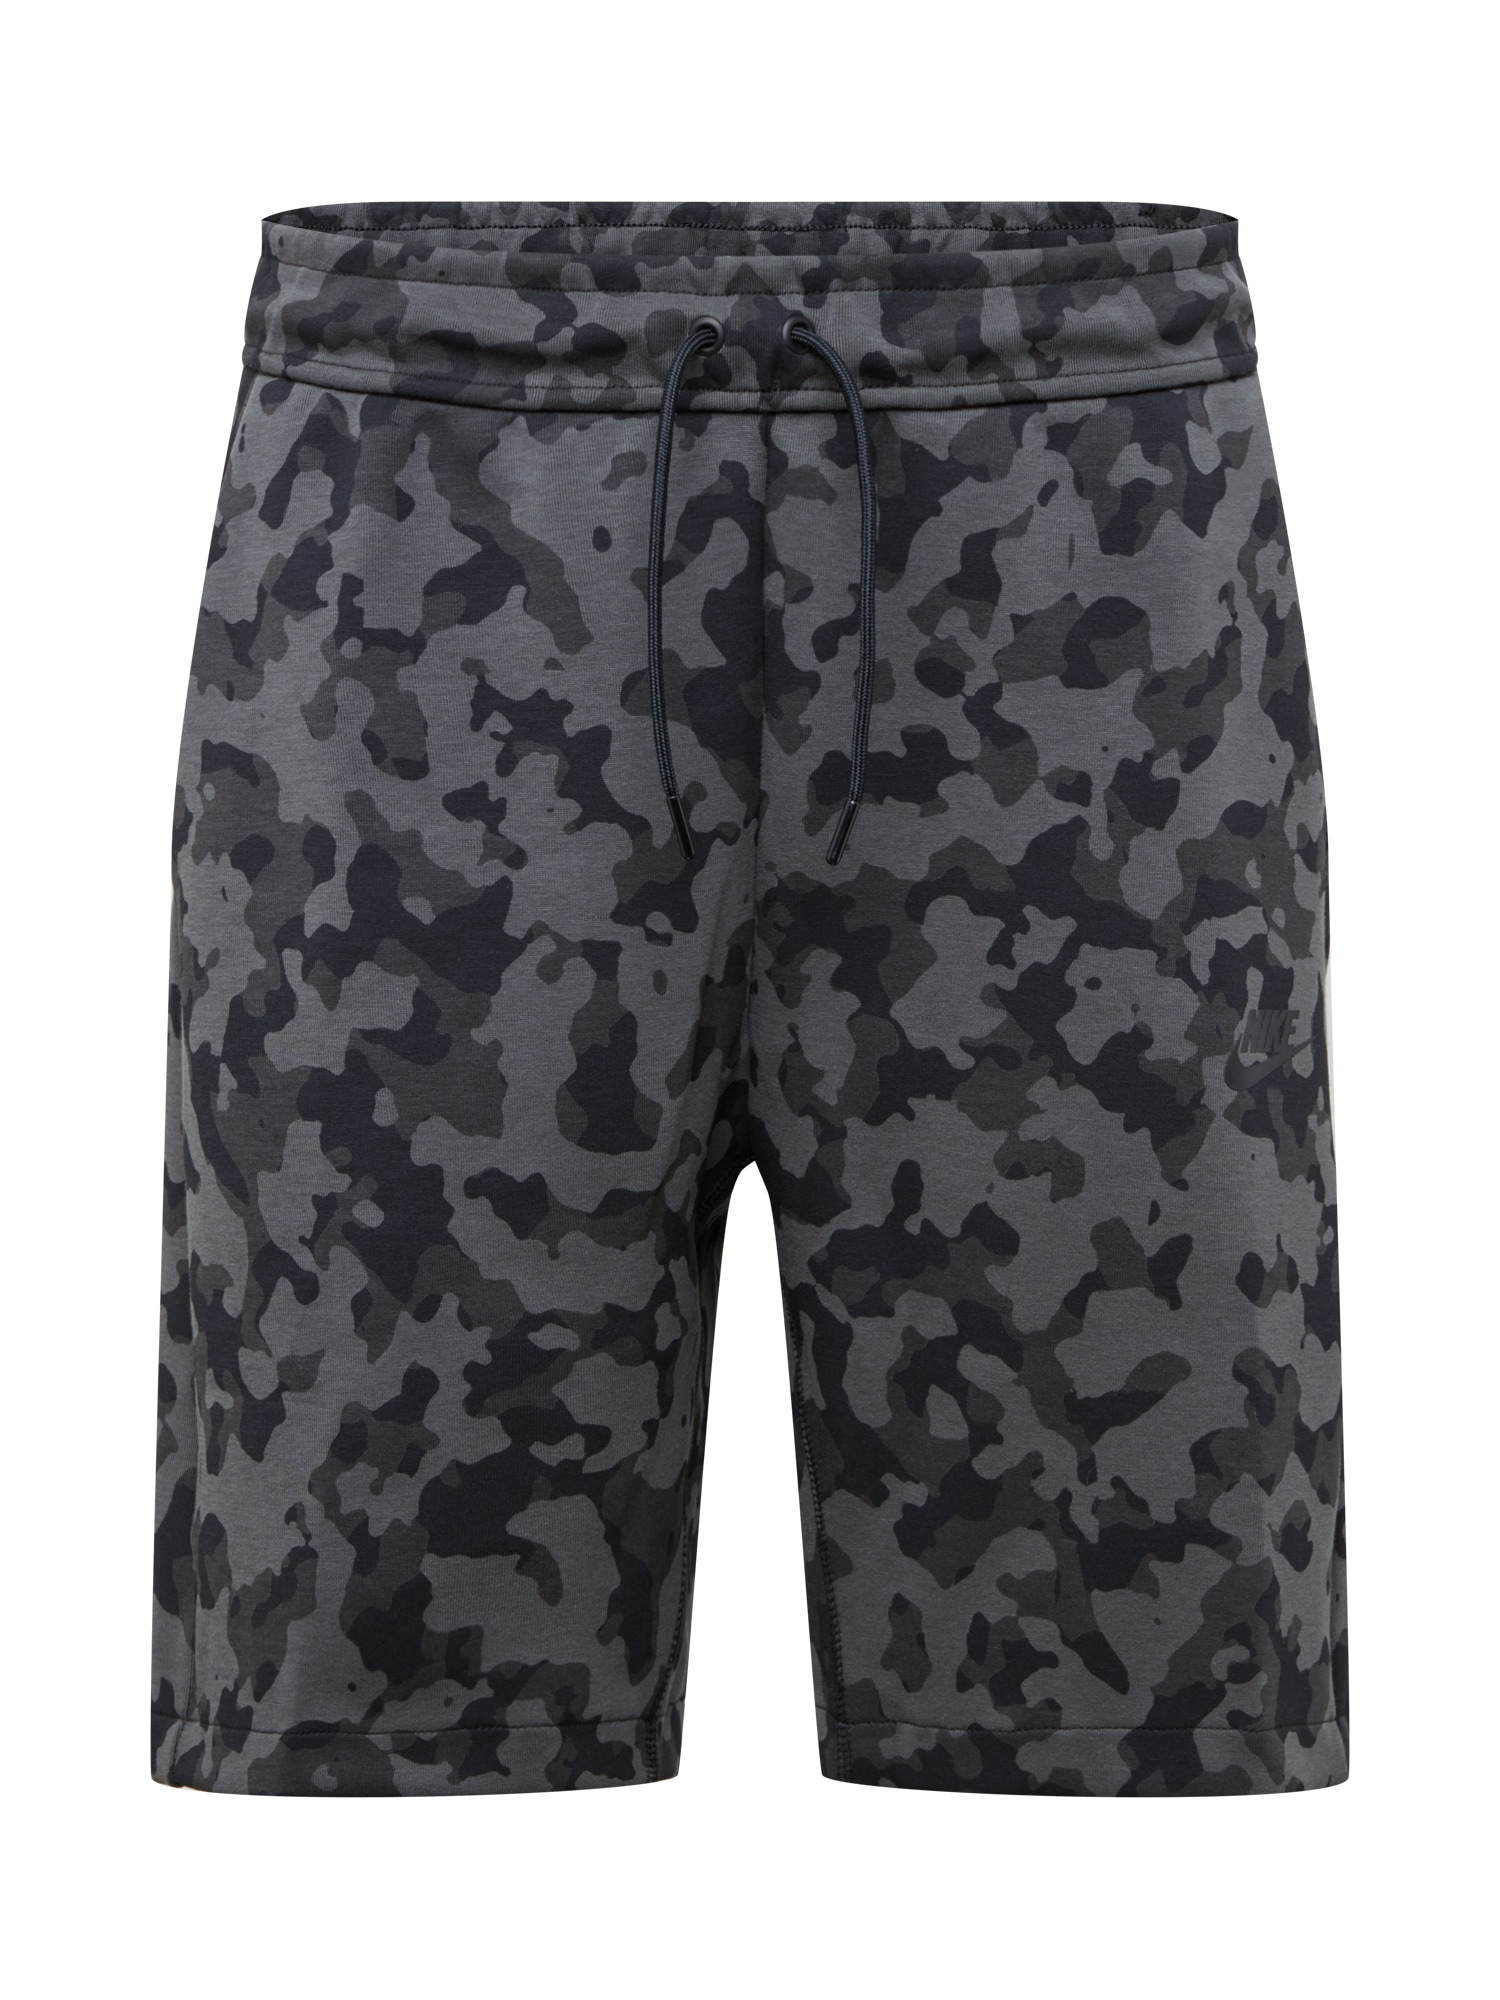 Nike Sportswear Kelnės pilka / juoda / tamsiai pilka